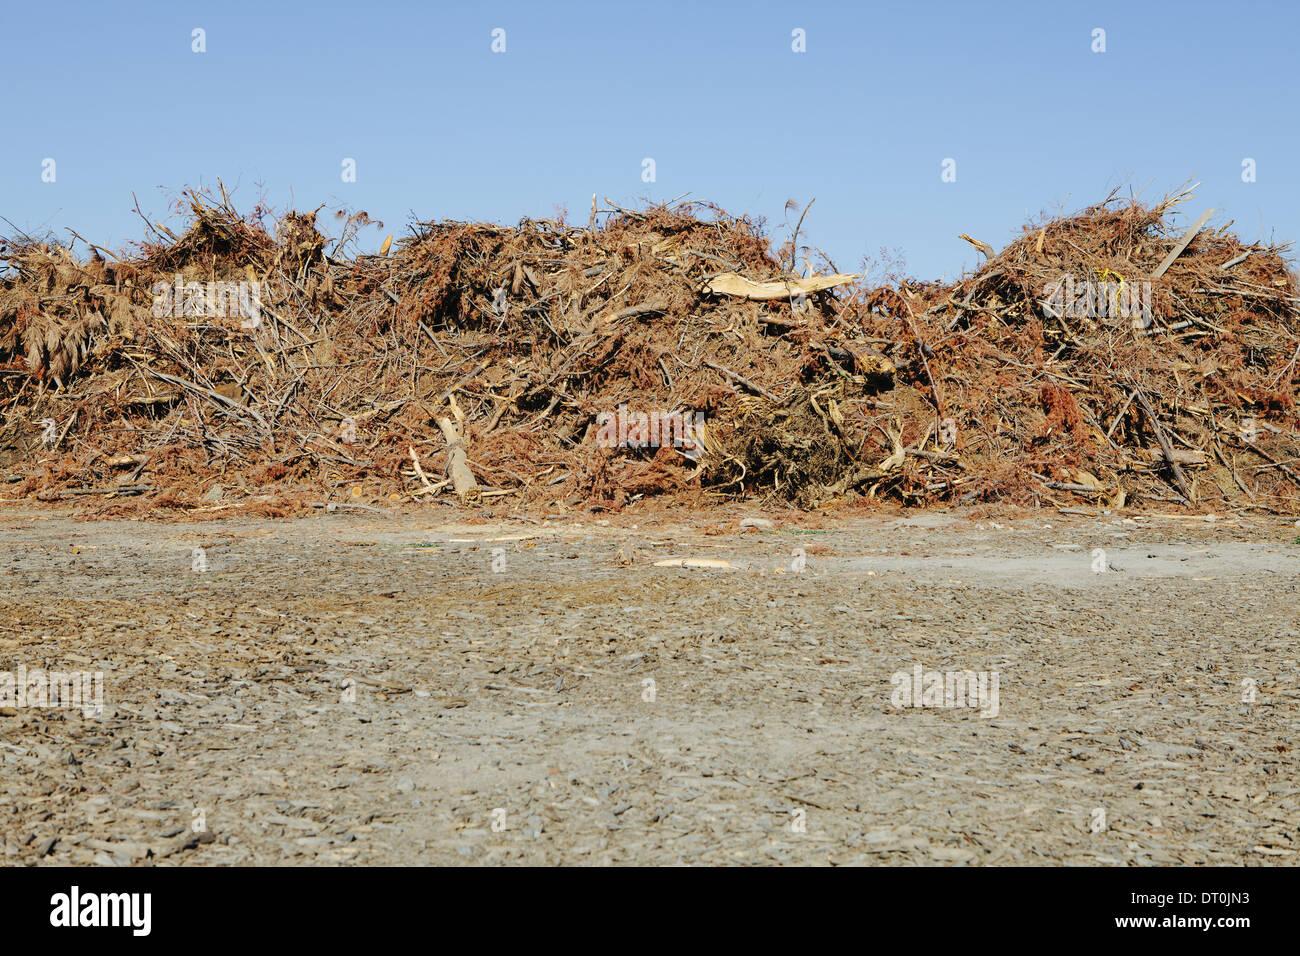 Washington state USA Pile of wood and tree debris - Stock Image